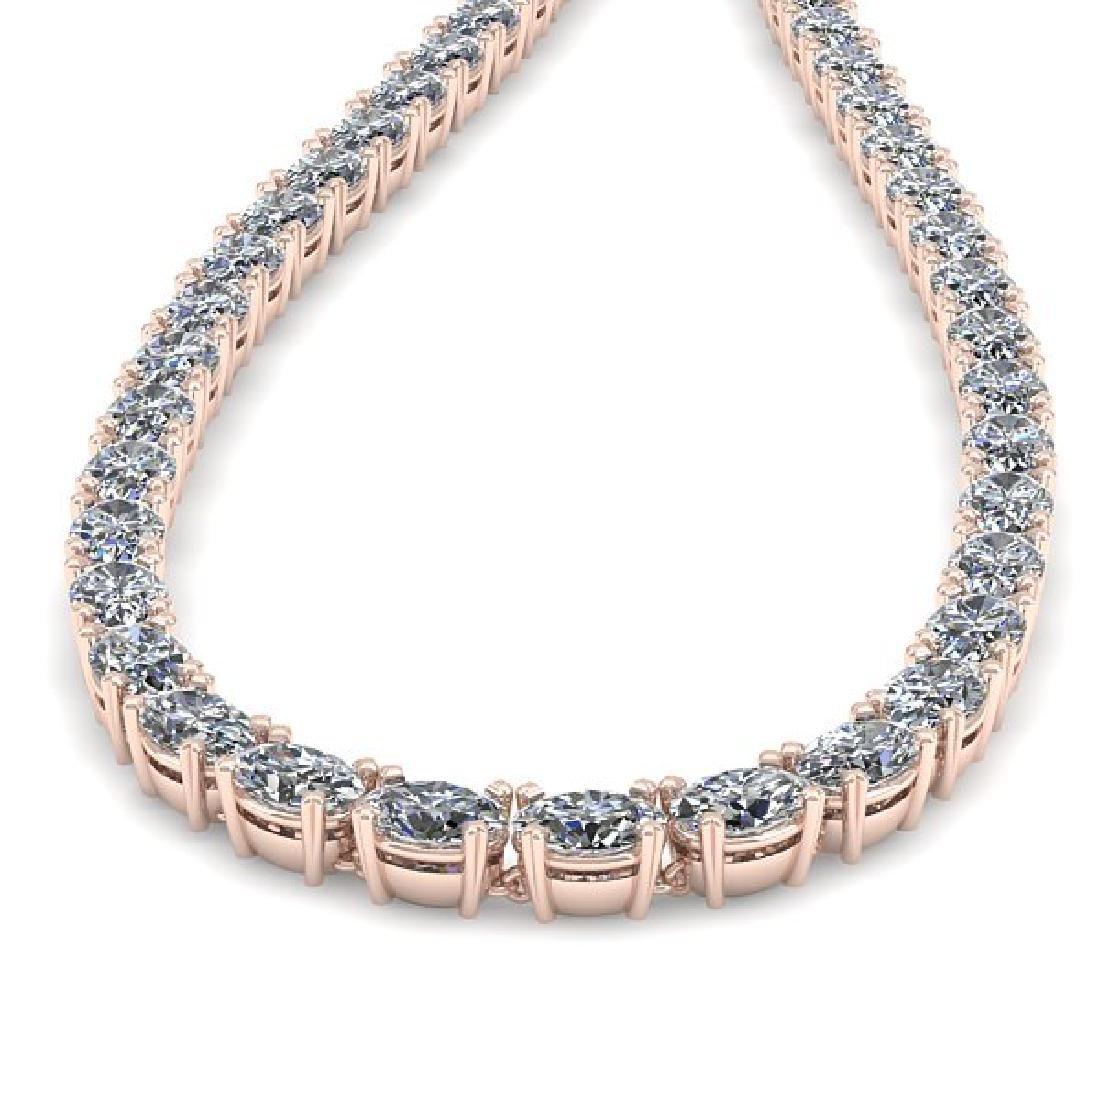 30 CTW Oval Cut Certified SI Diamond Necklace 14K Rose - 2